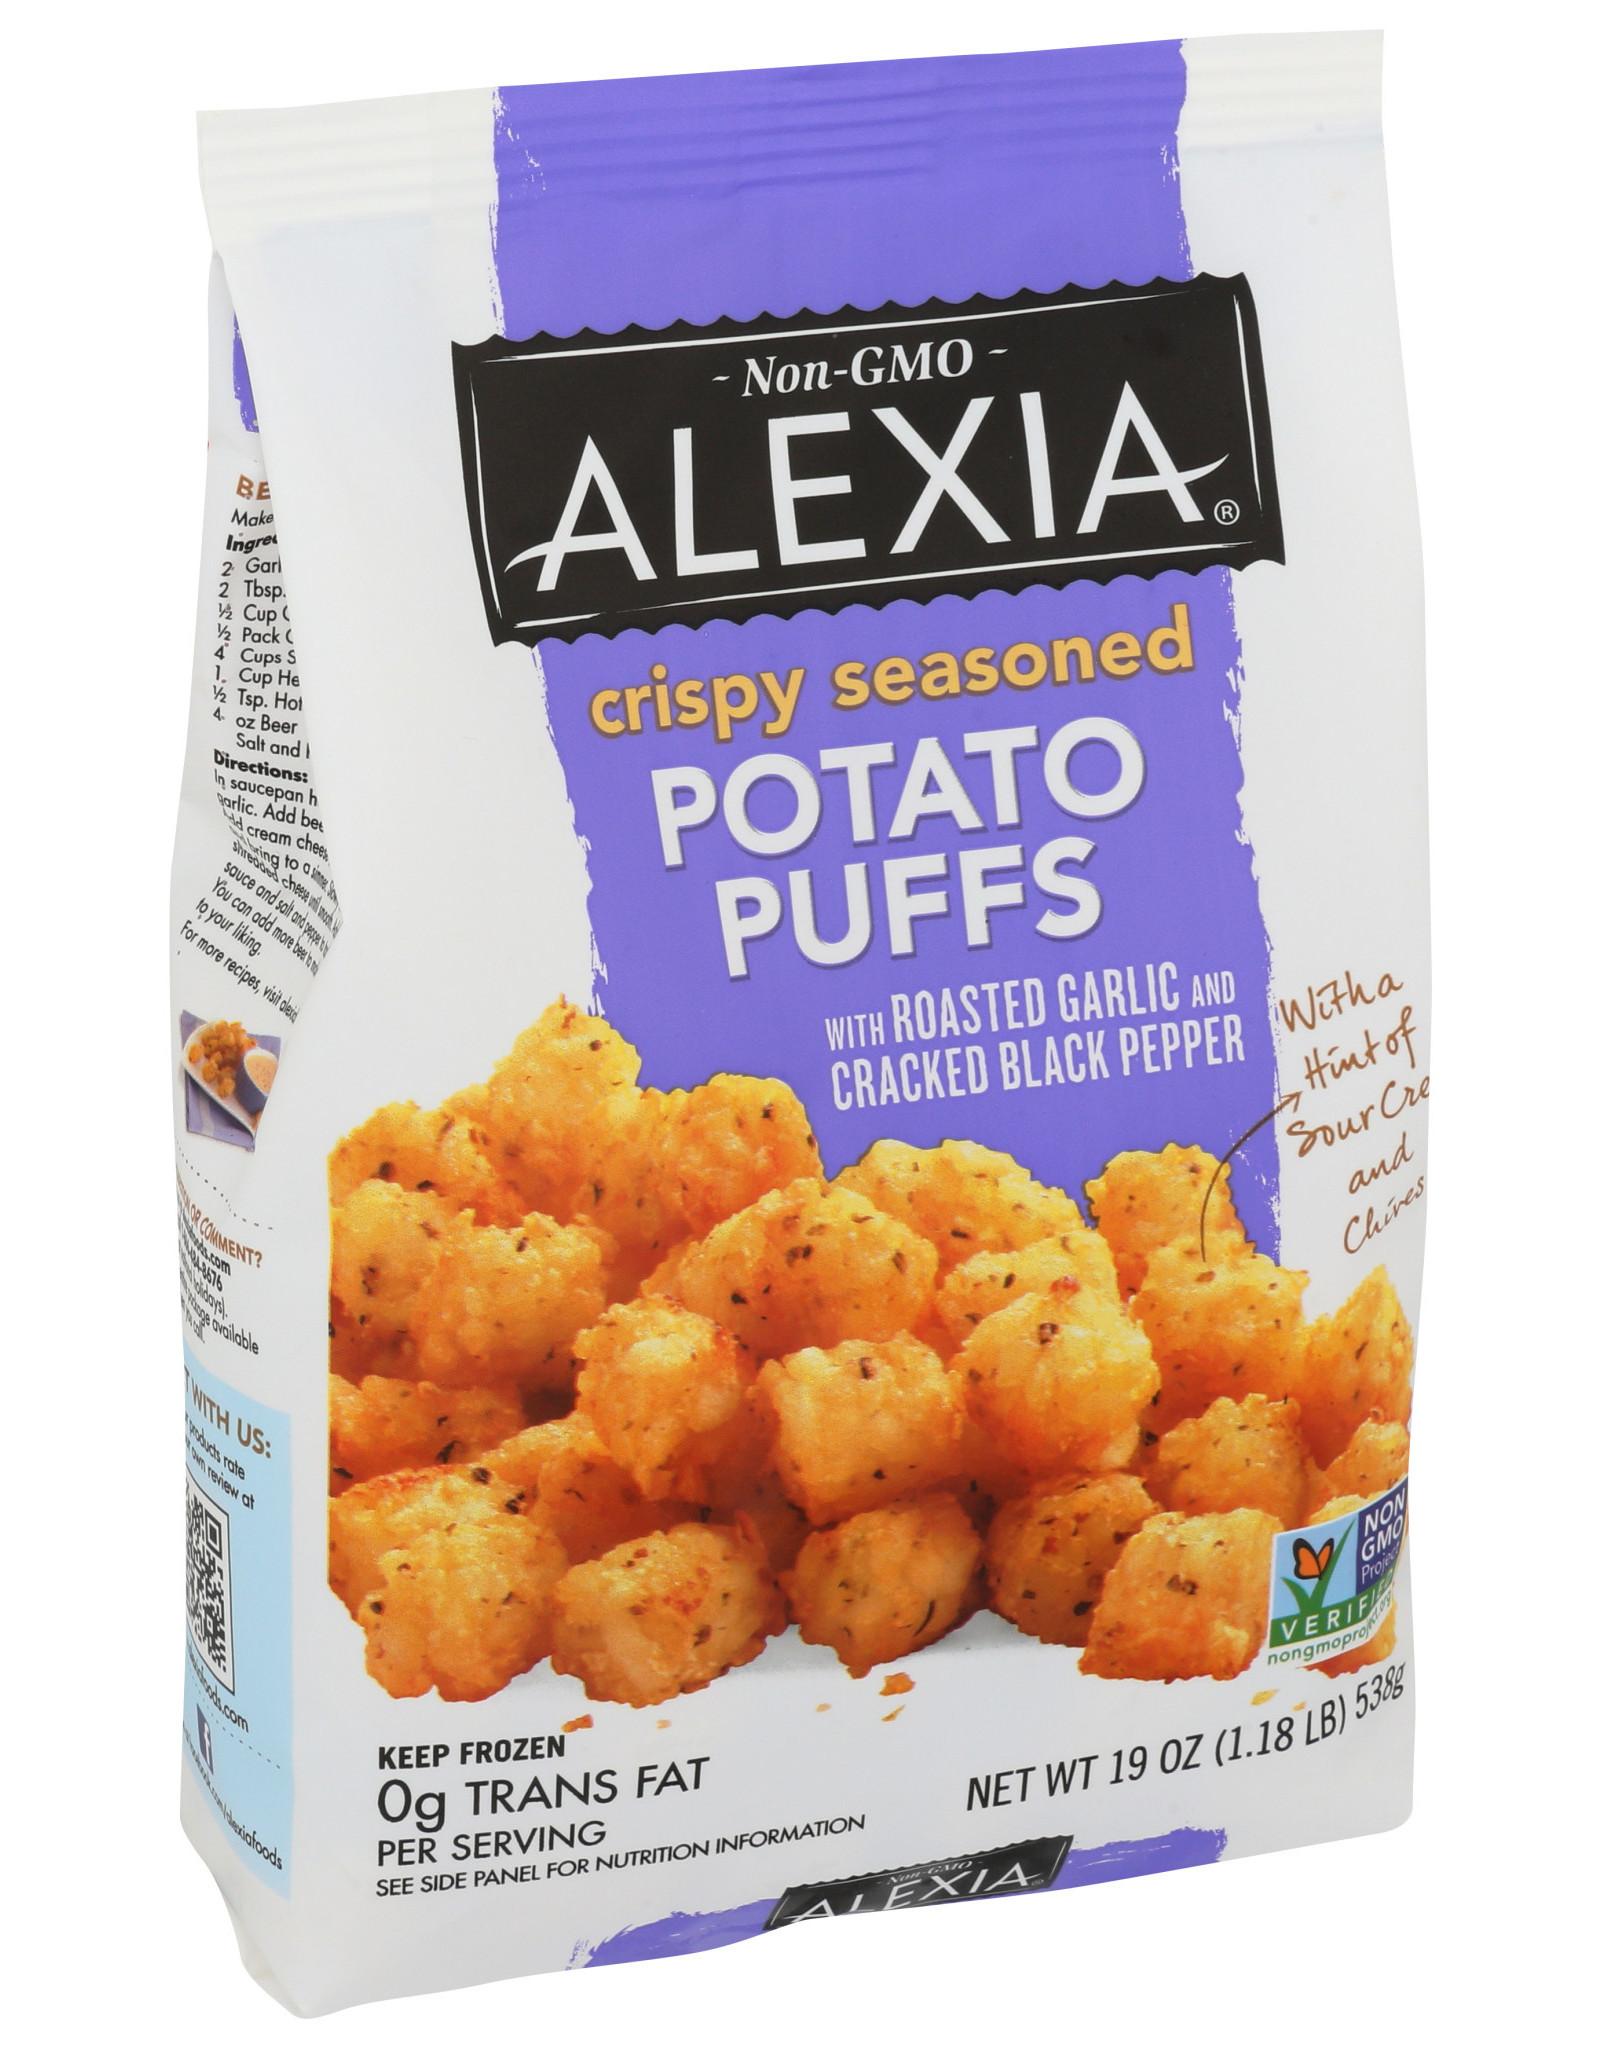 Alexia Crispy Seasoned Potato Puffs 19 oz